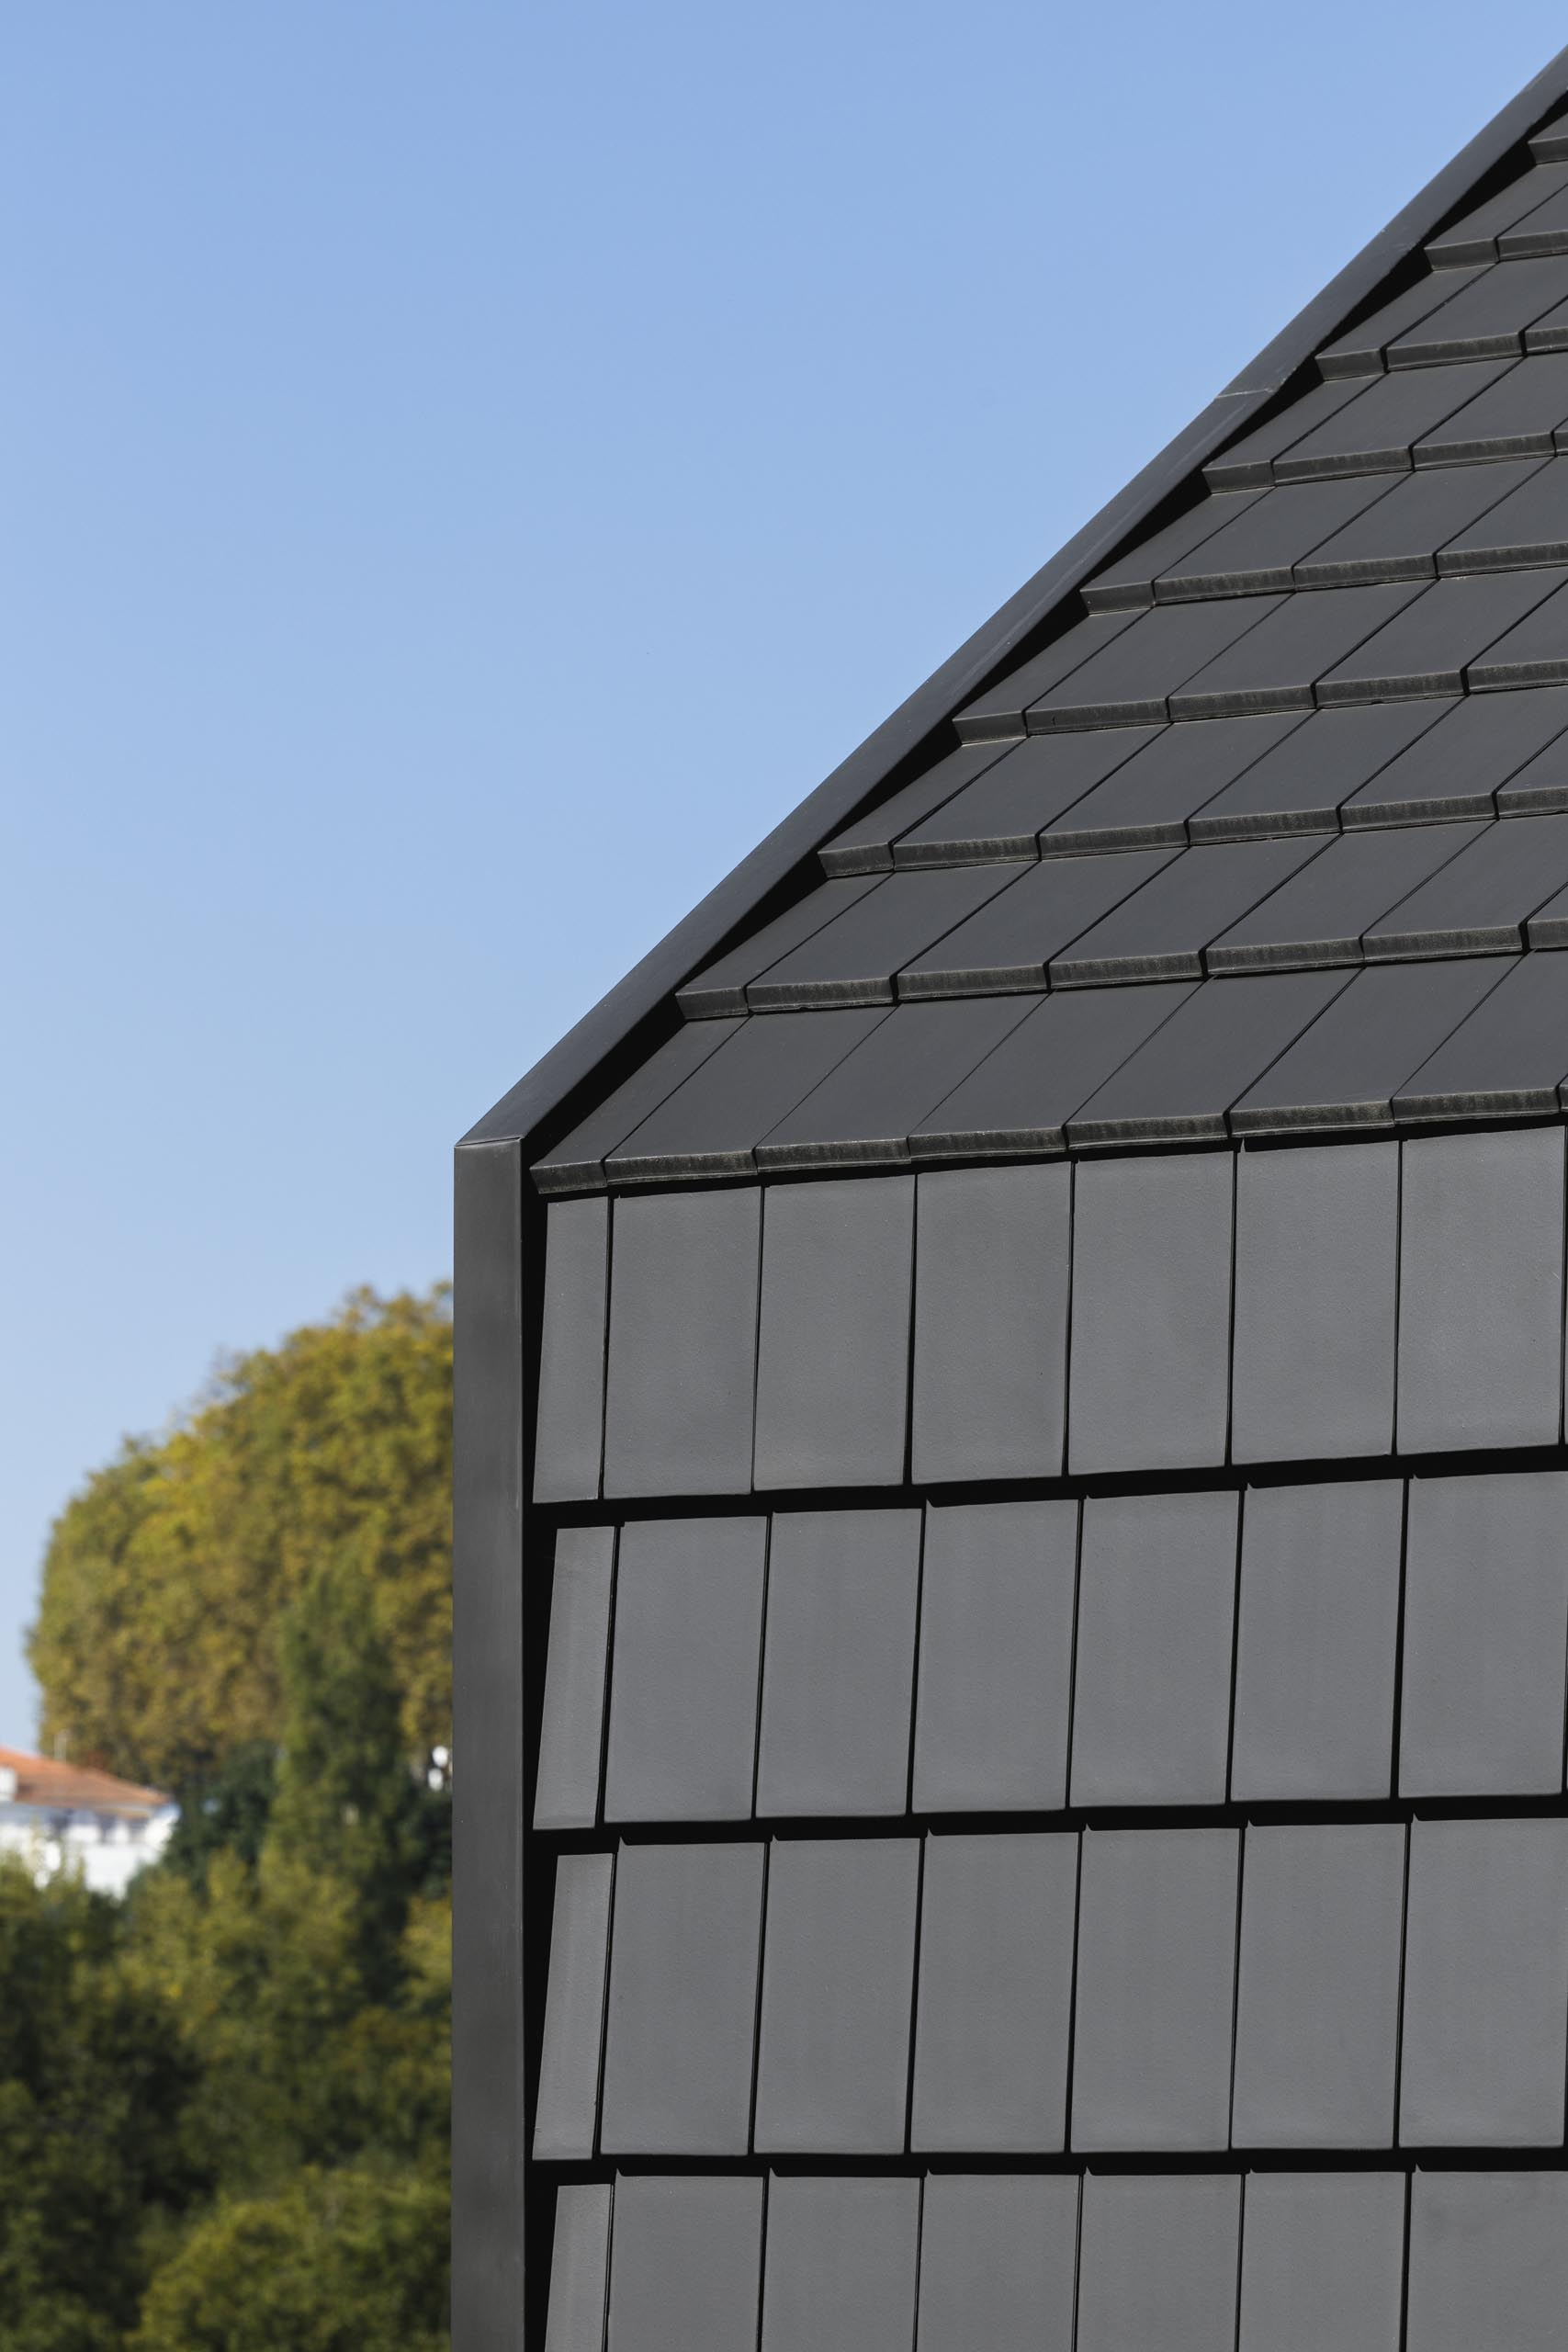 A modern house with black shingles.